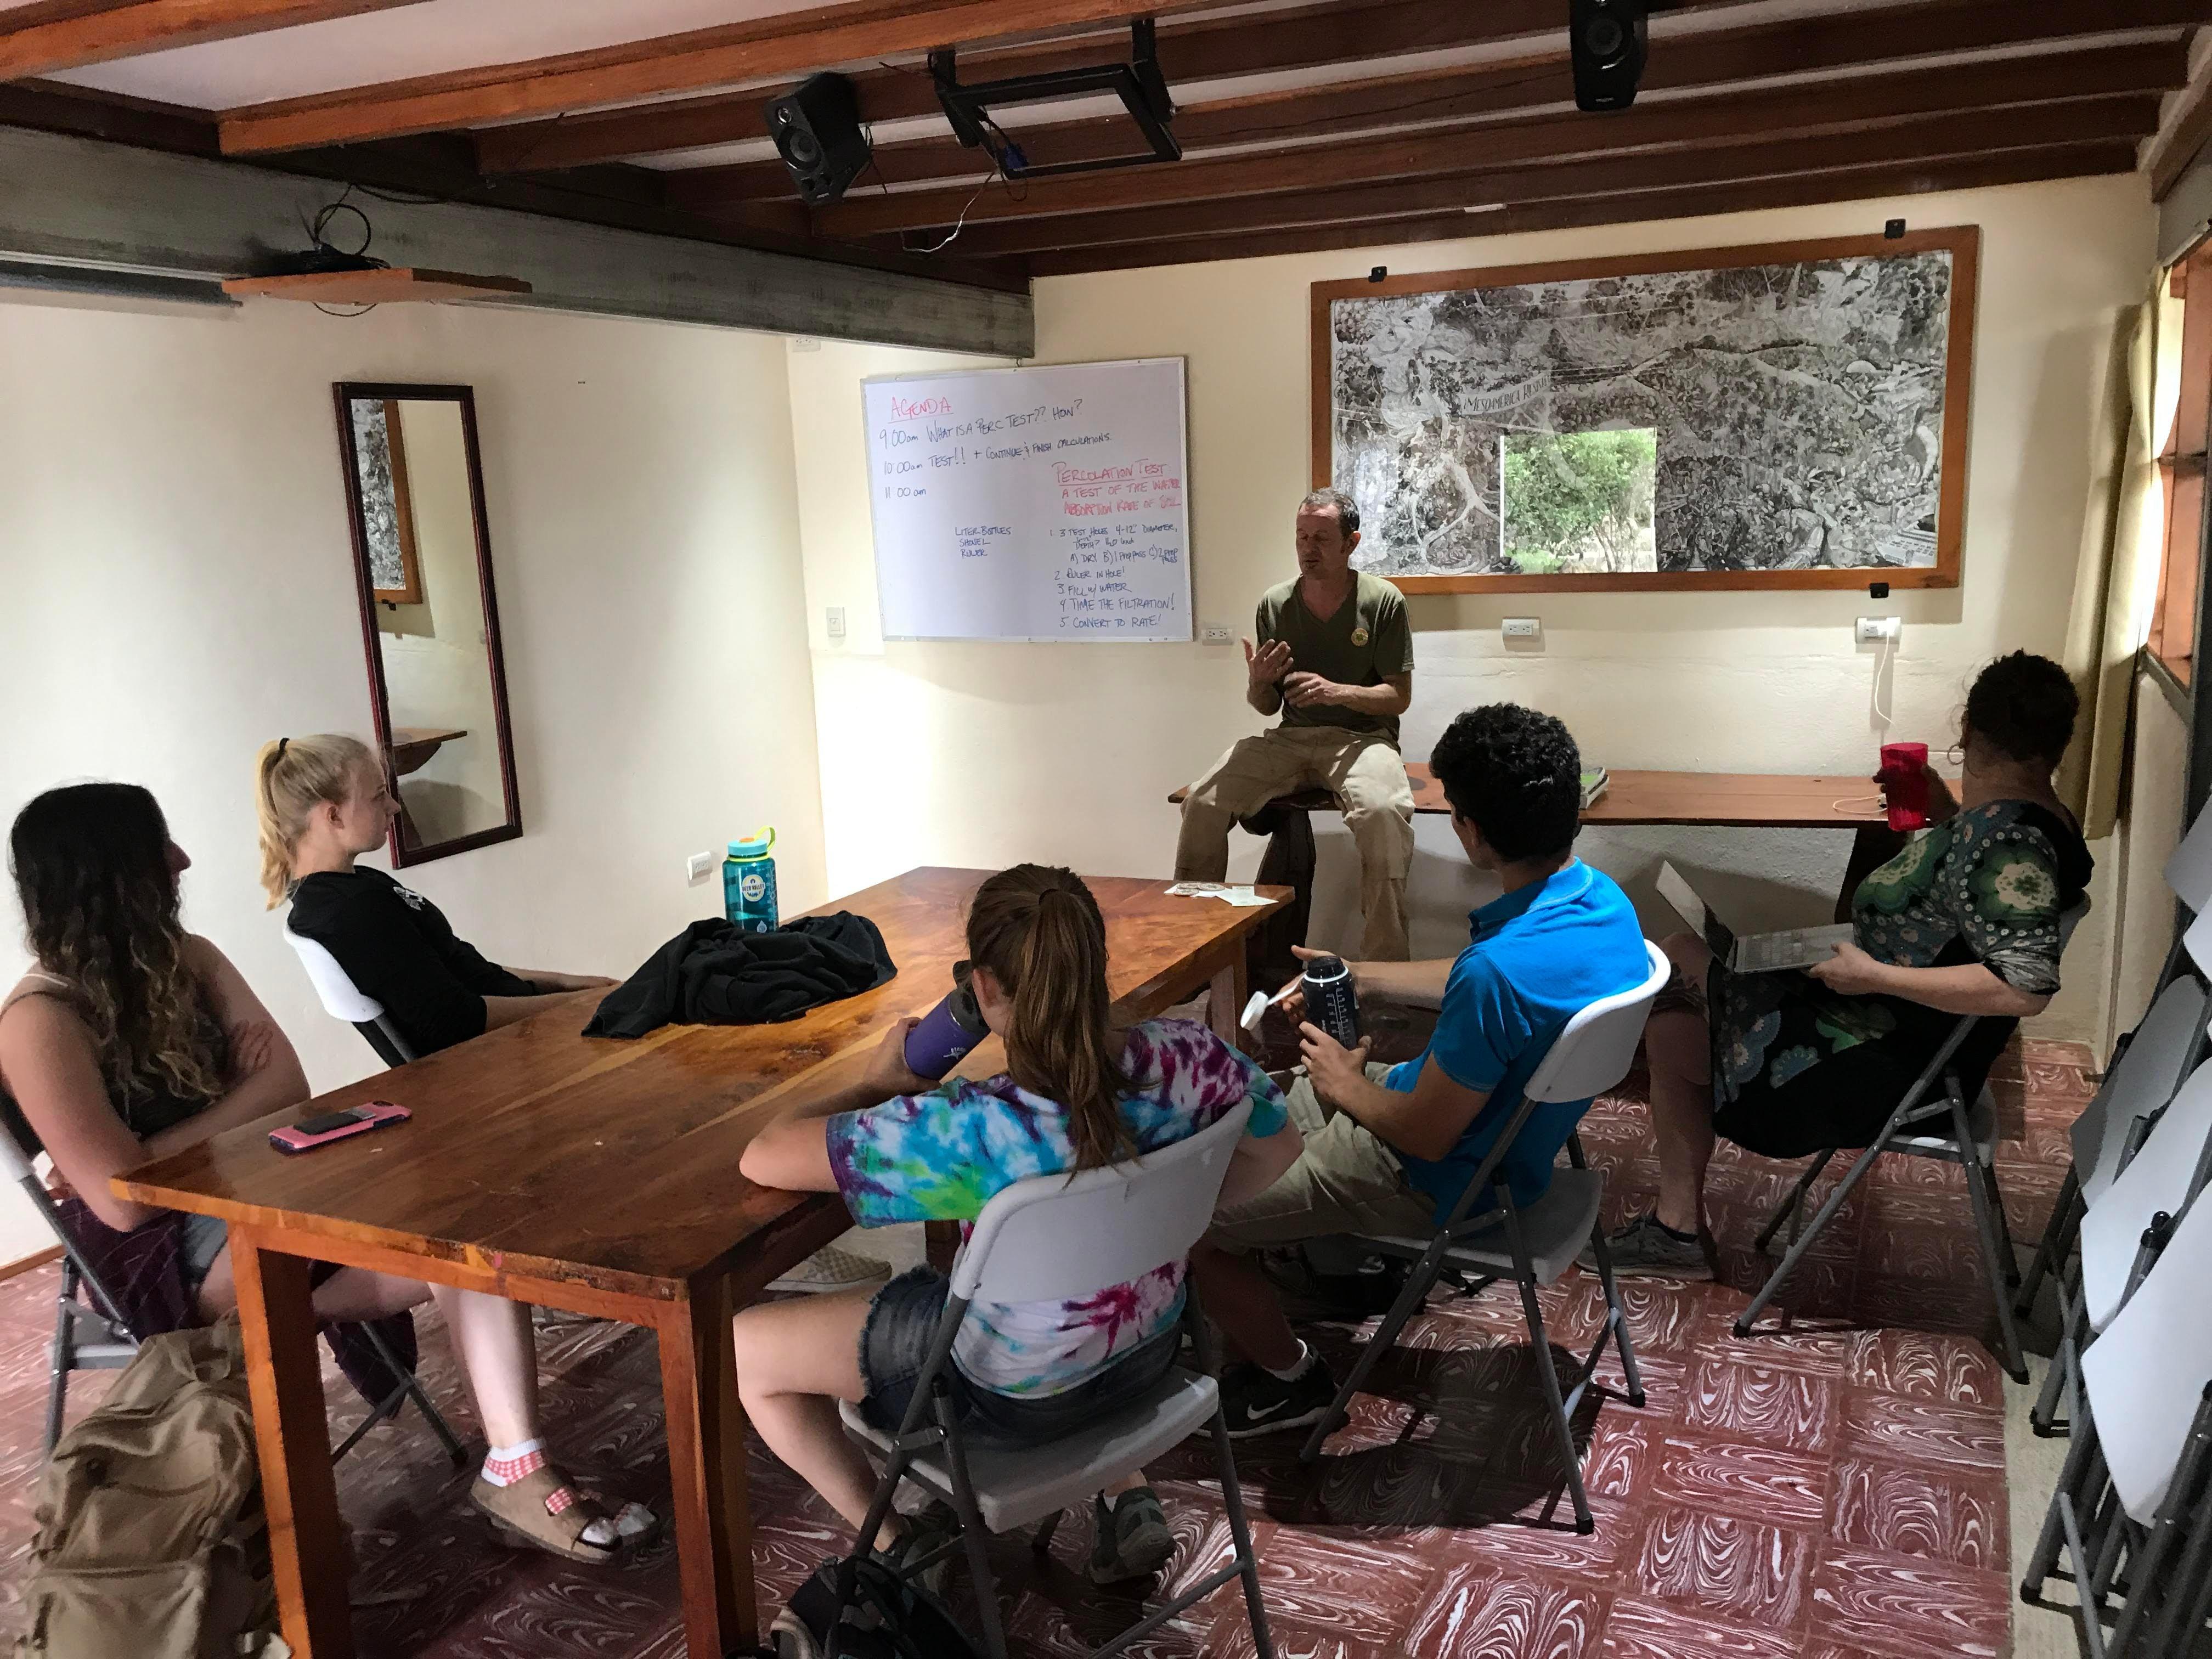 Proctor Academy in Costa Rica Boarding School Study Abroad